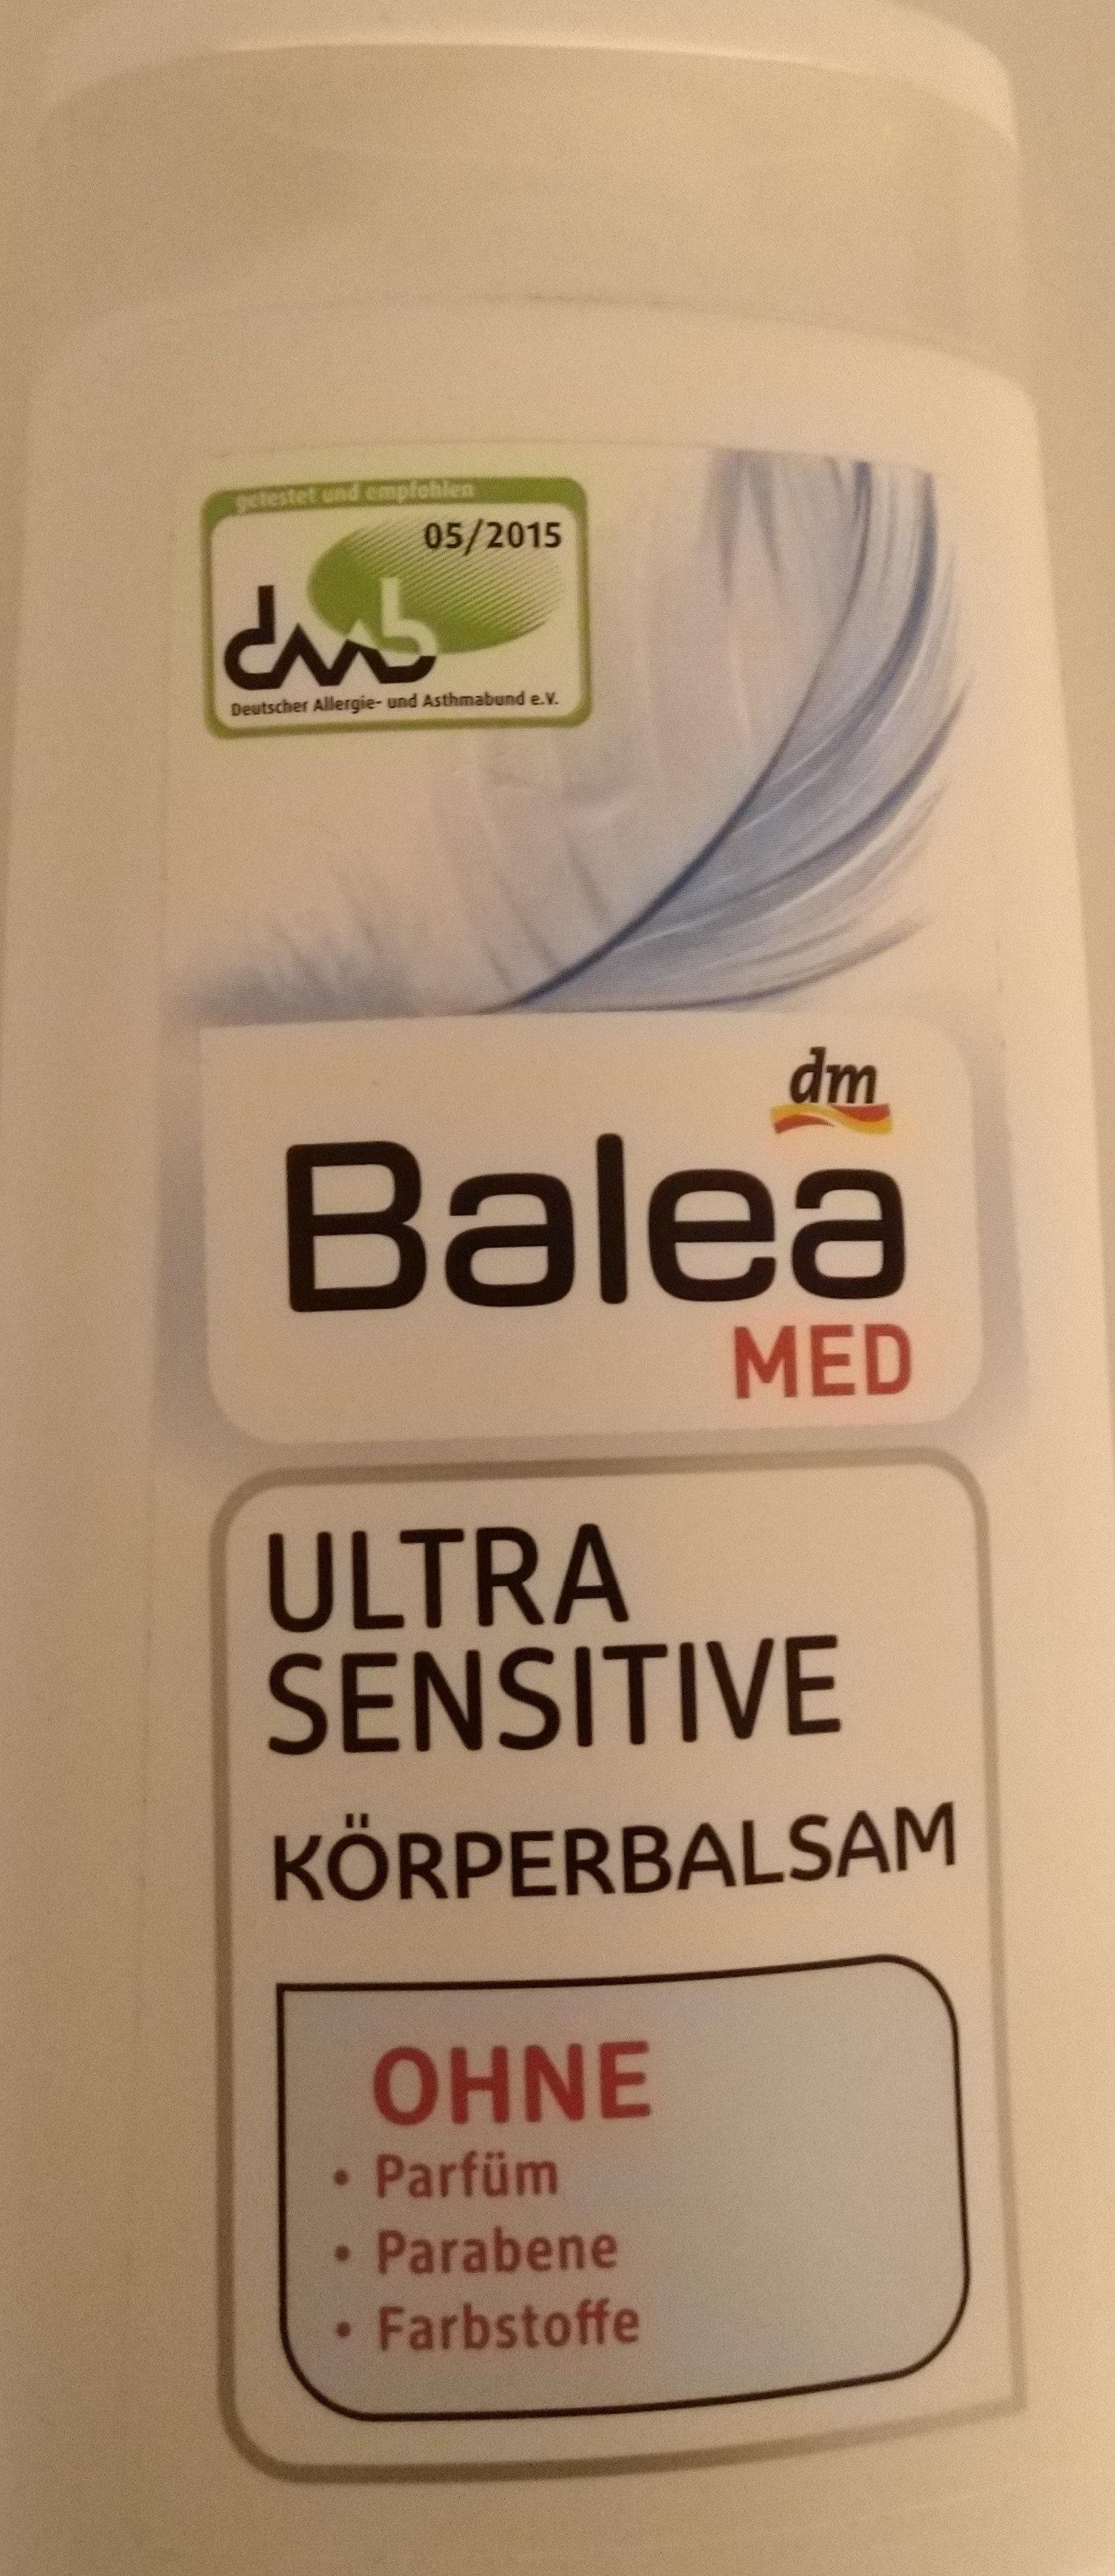 Ultra Sensitive Körperbalsam - Product